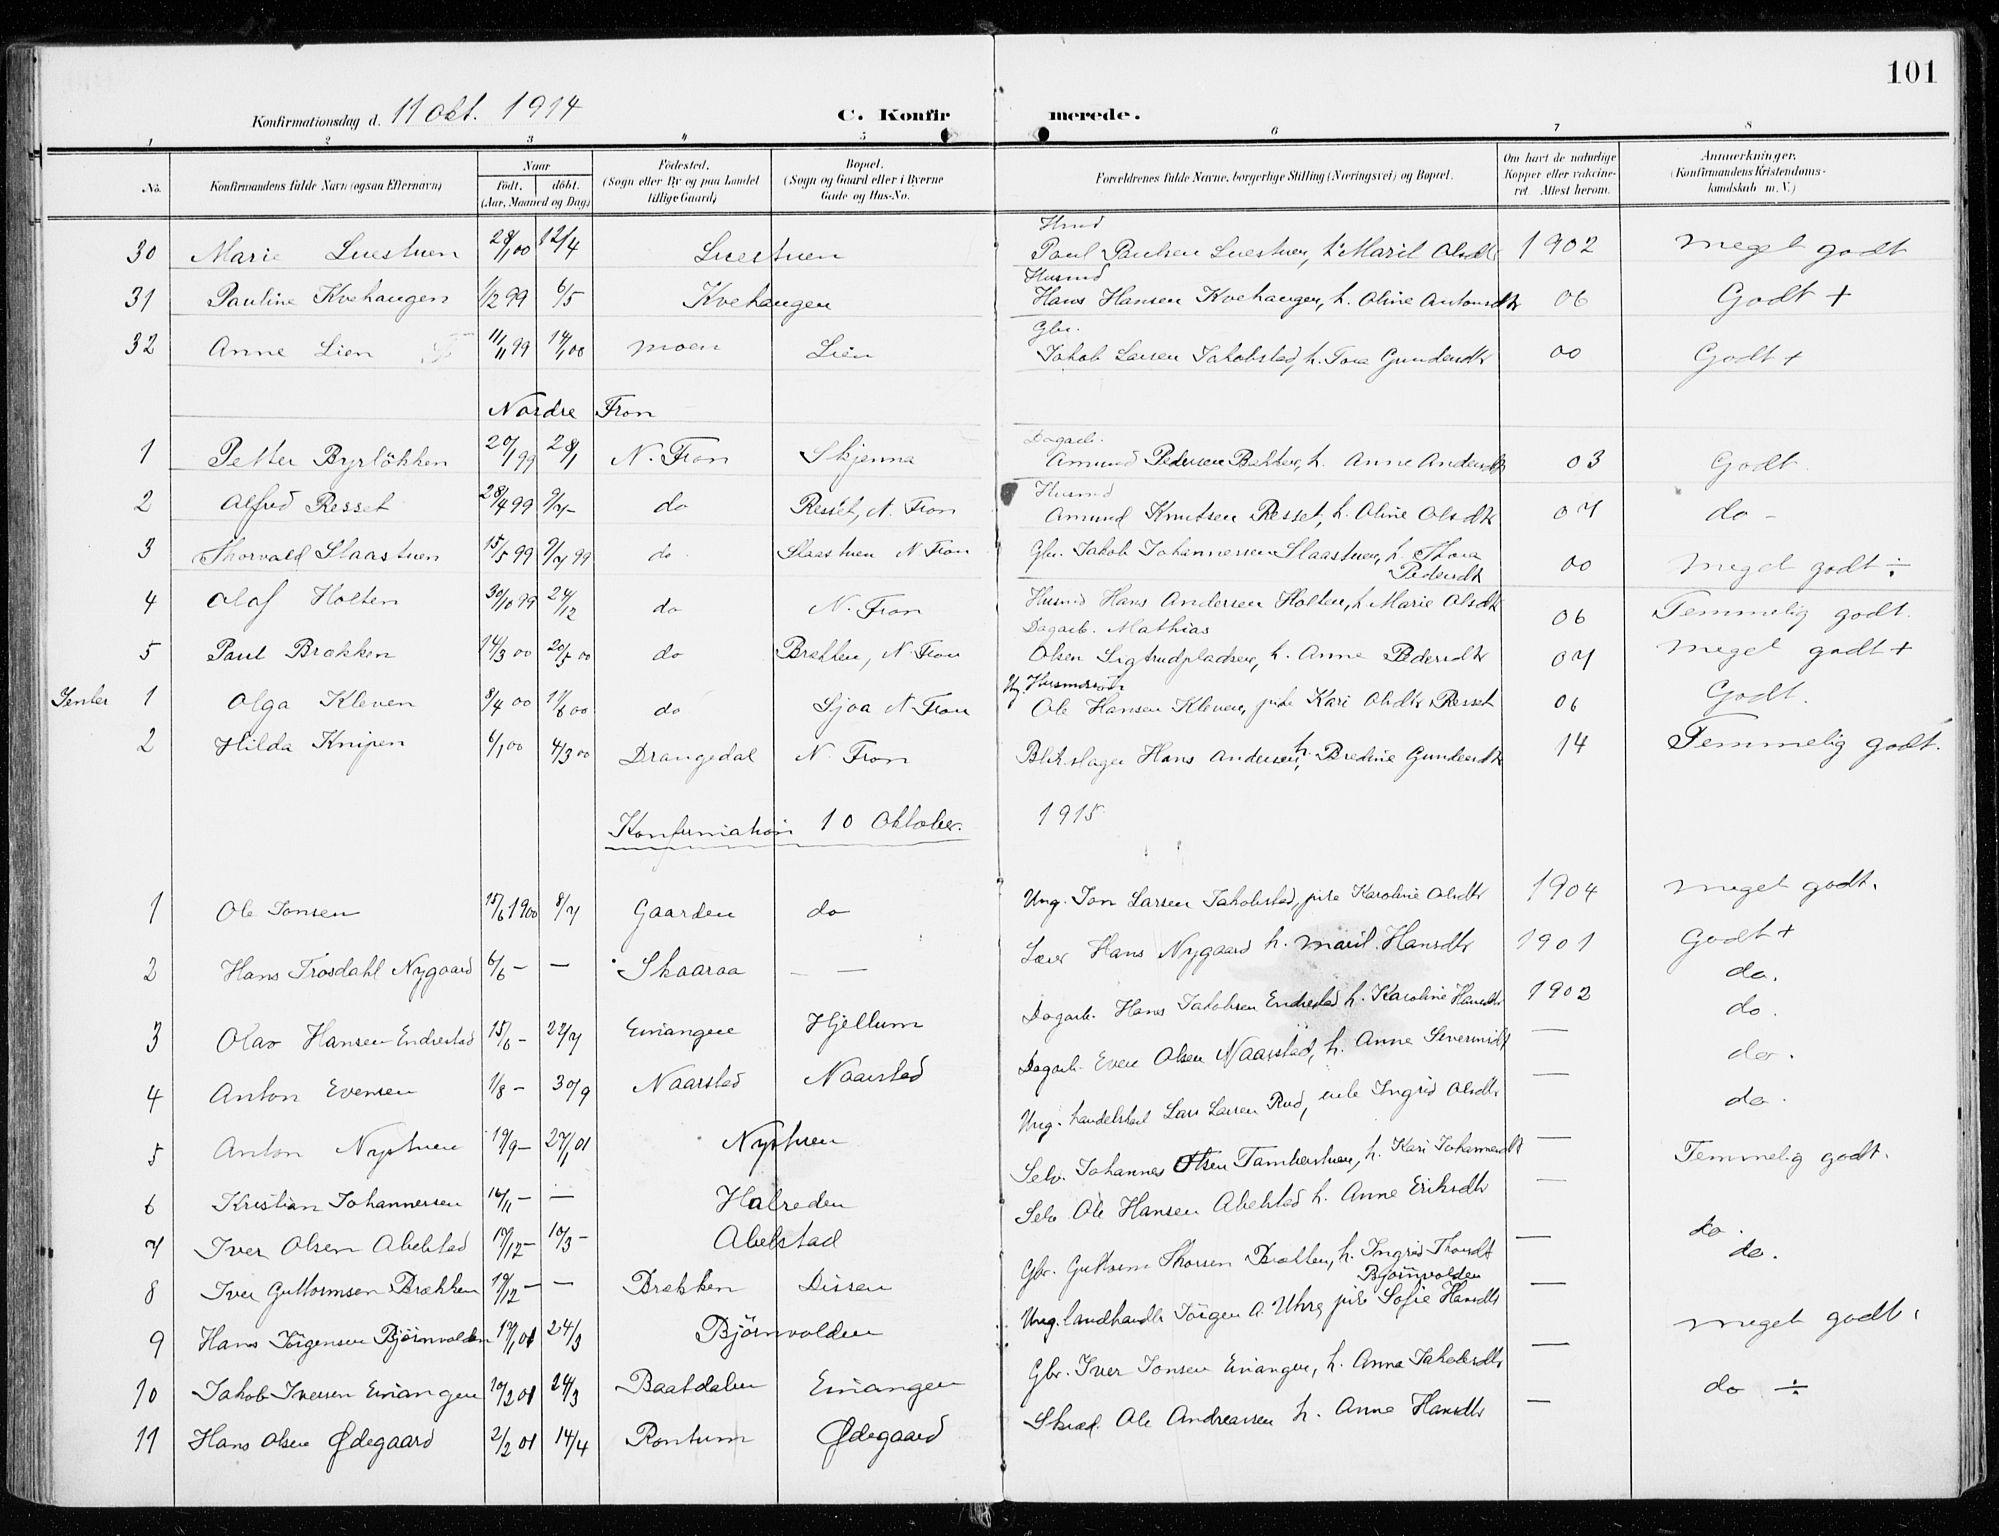 SAH, Sel prestekontor, Ministerialbok nr. 2, 1905-1919, s. 101